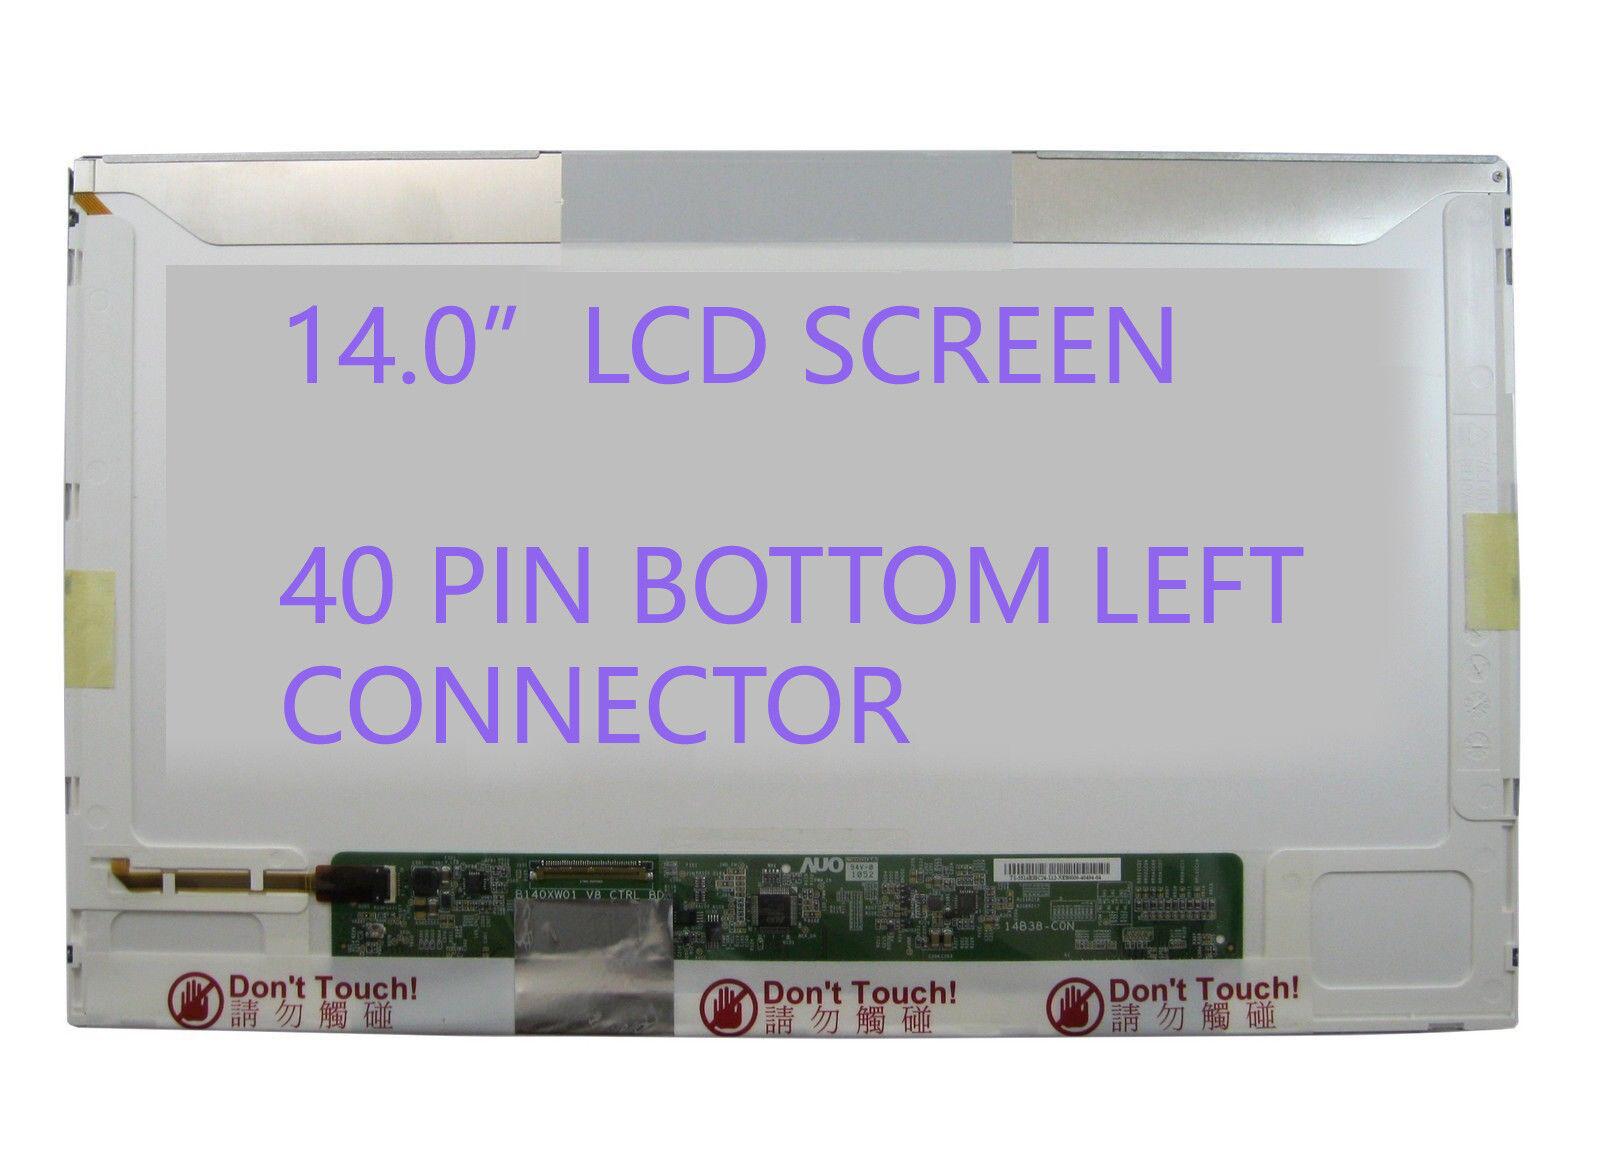 LAPTOP LCD LED SCREEN Display FOR PANASONIC TOUGHBOOK CF-53JULZK1M 14.0 WXGA